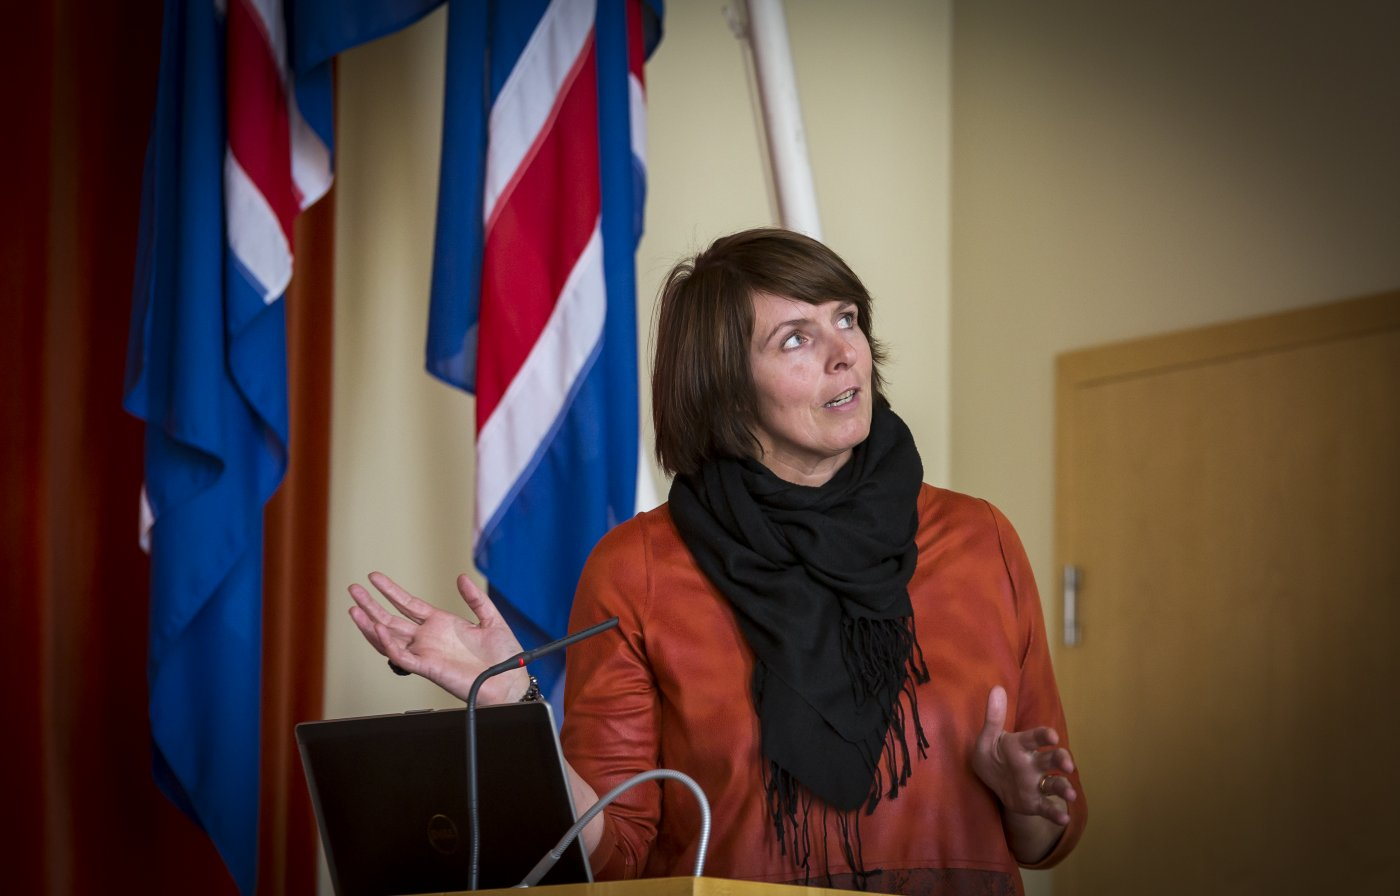 Ingibjörg Gunnarsdótti